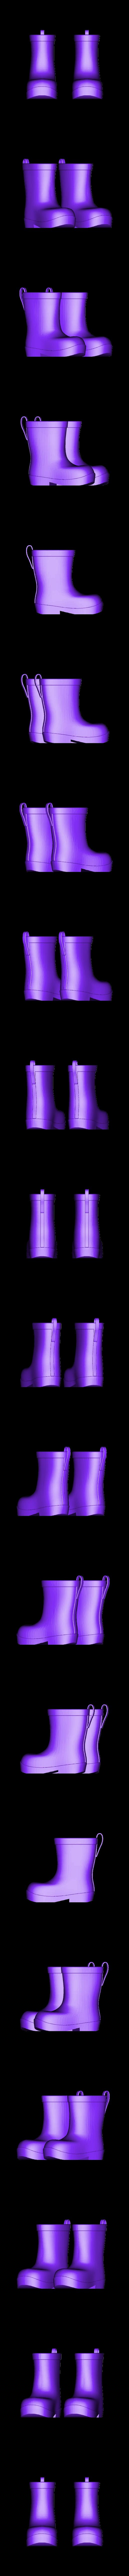 86Duino-rain-boots.stl Download free STL file Rain boots • 3D printing object, 86Duino